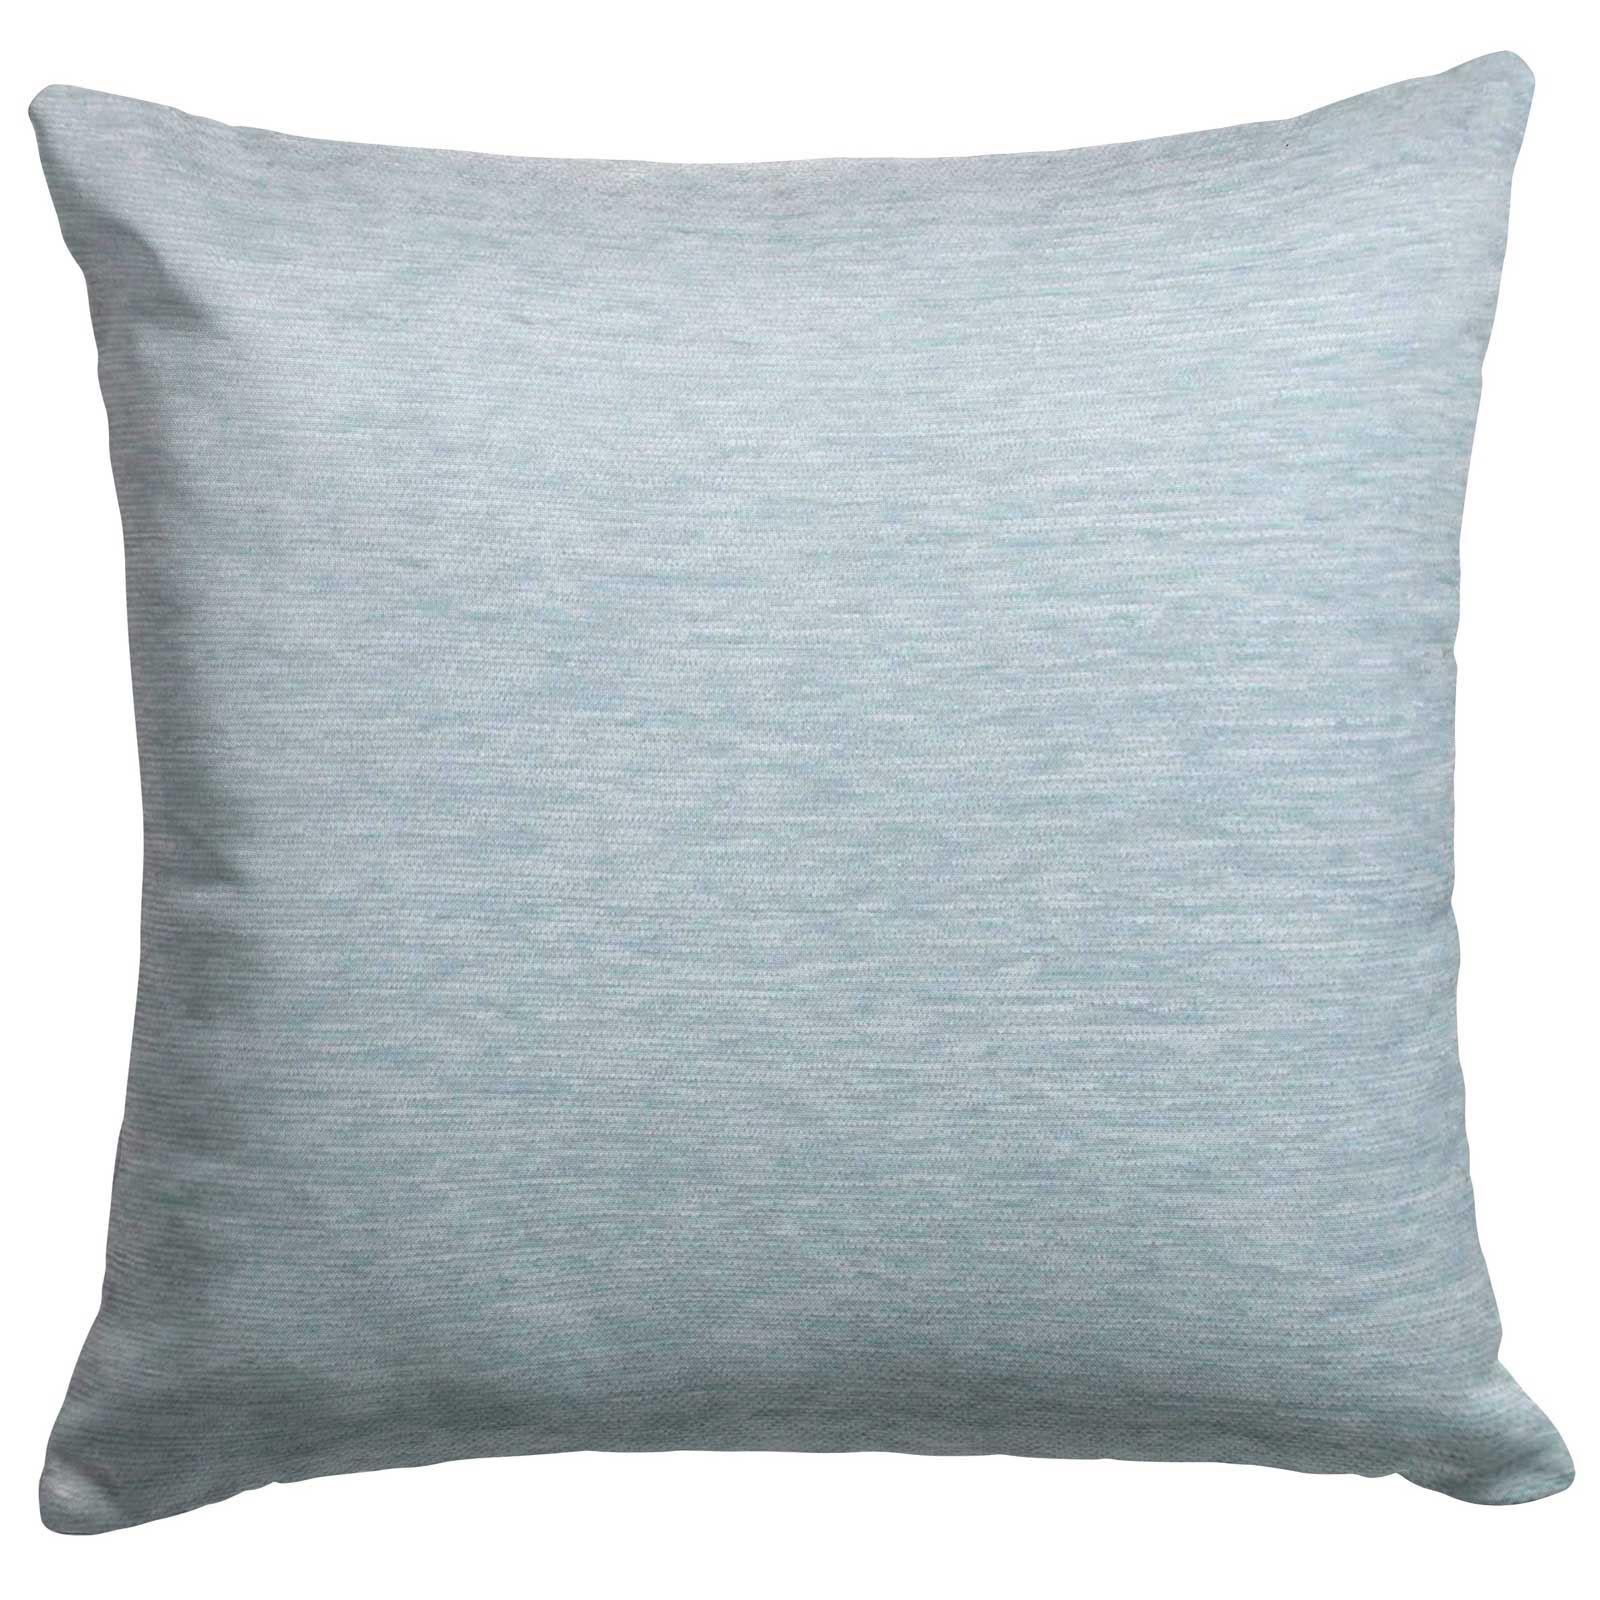 Set-of-2-Chenille-Cushion-Covers-Luxury-Plain-Cushions-Cover-Pairs-18-034-x-18-034 thumbnail 29